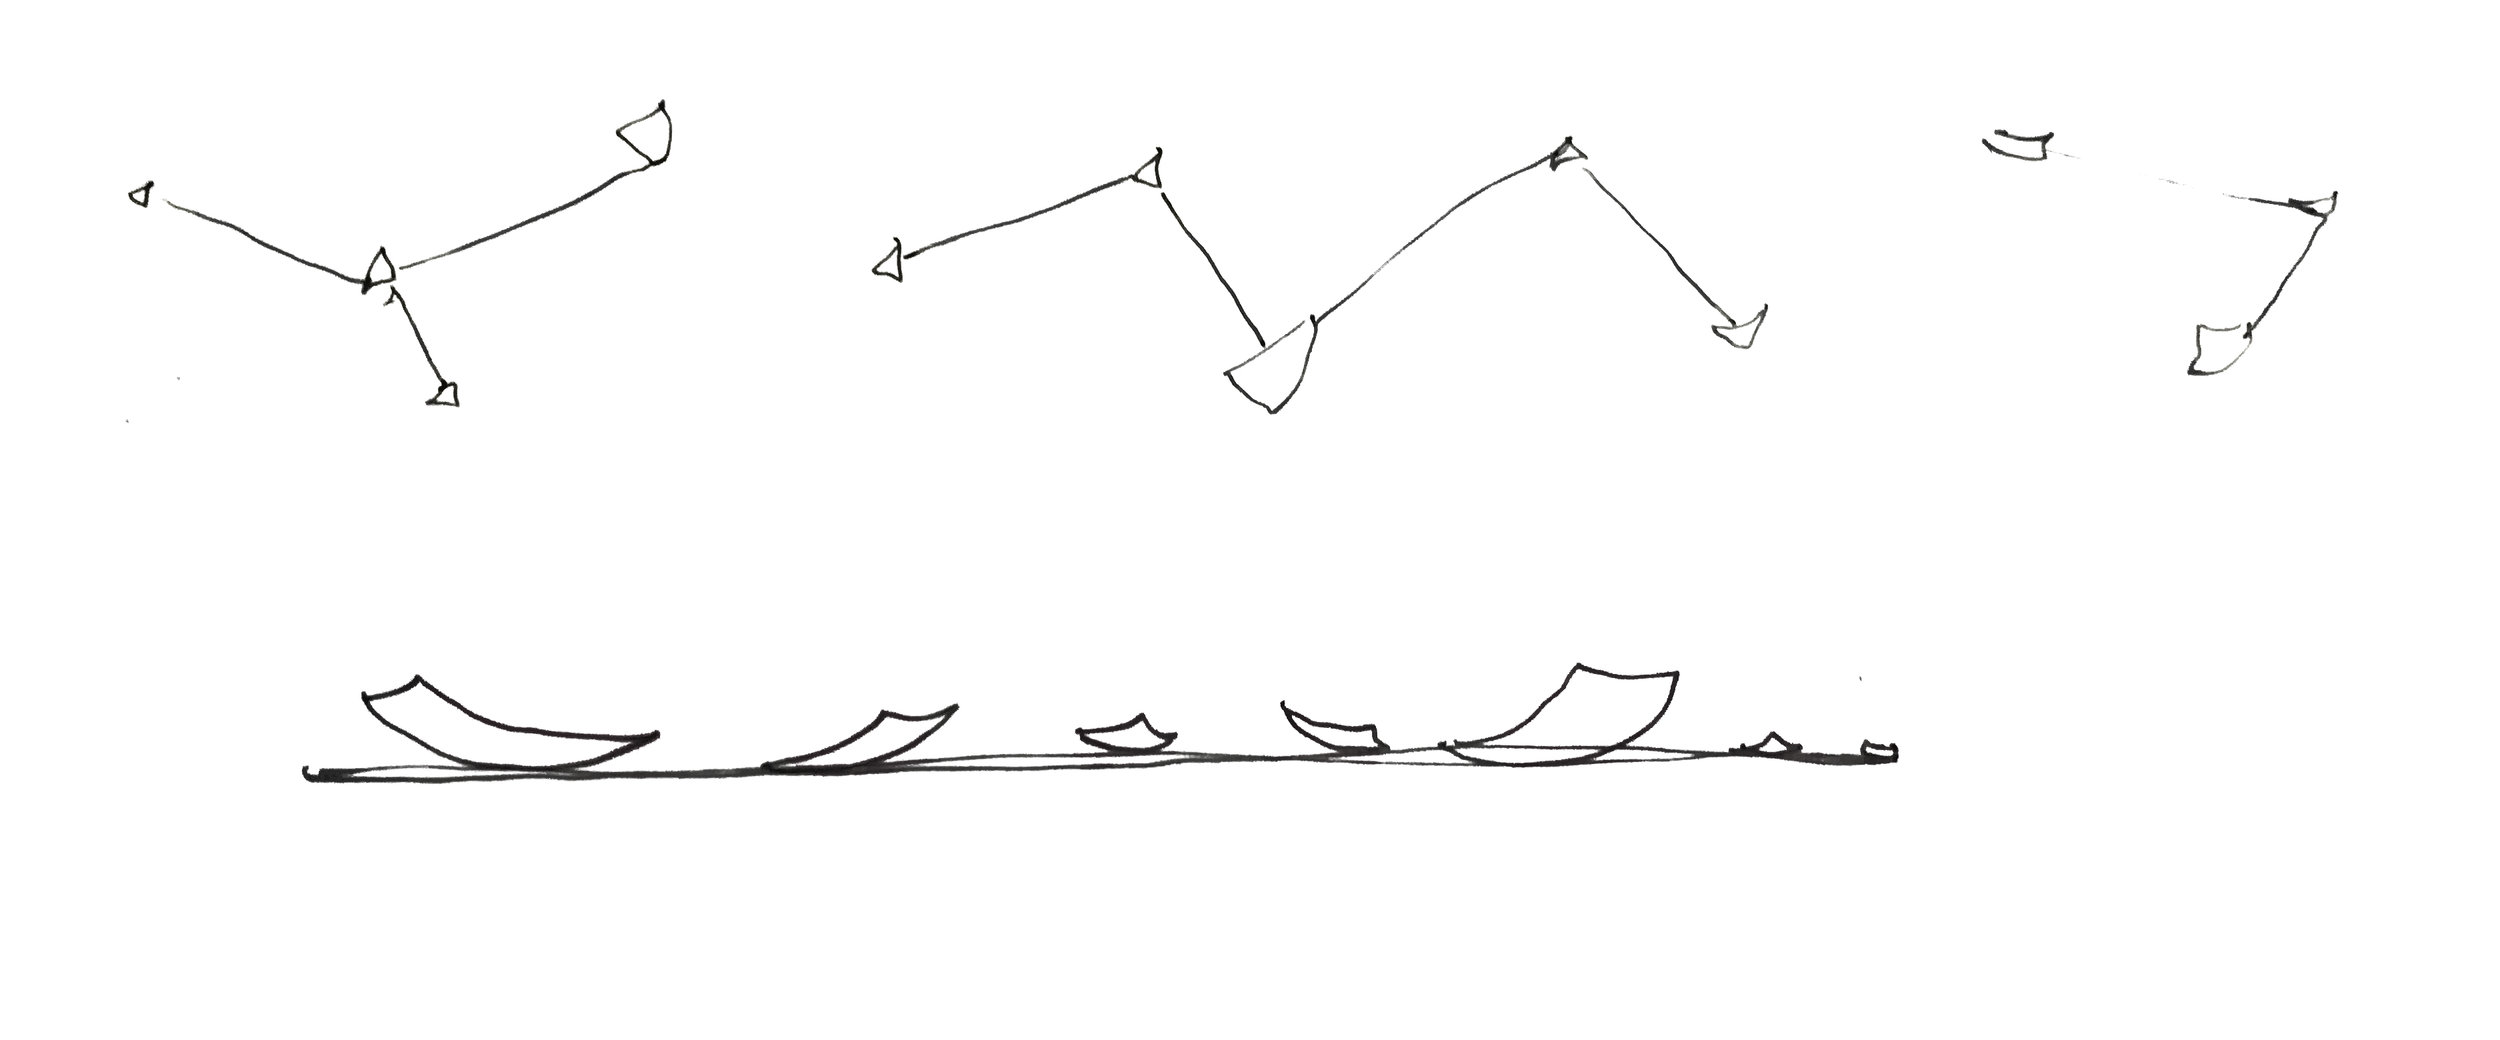 ideation_drawing_1_website.jpg